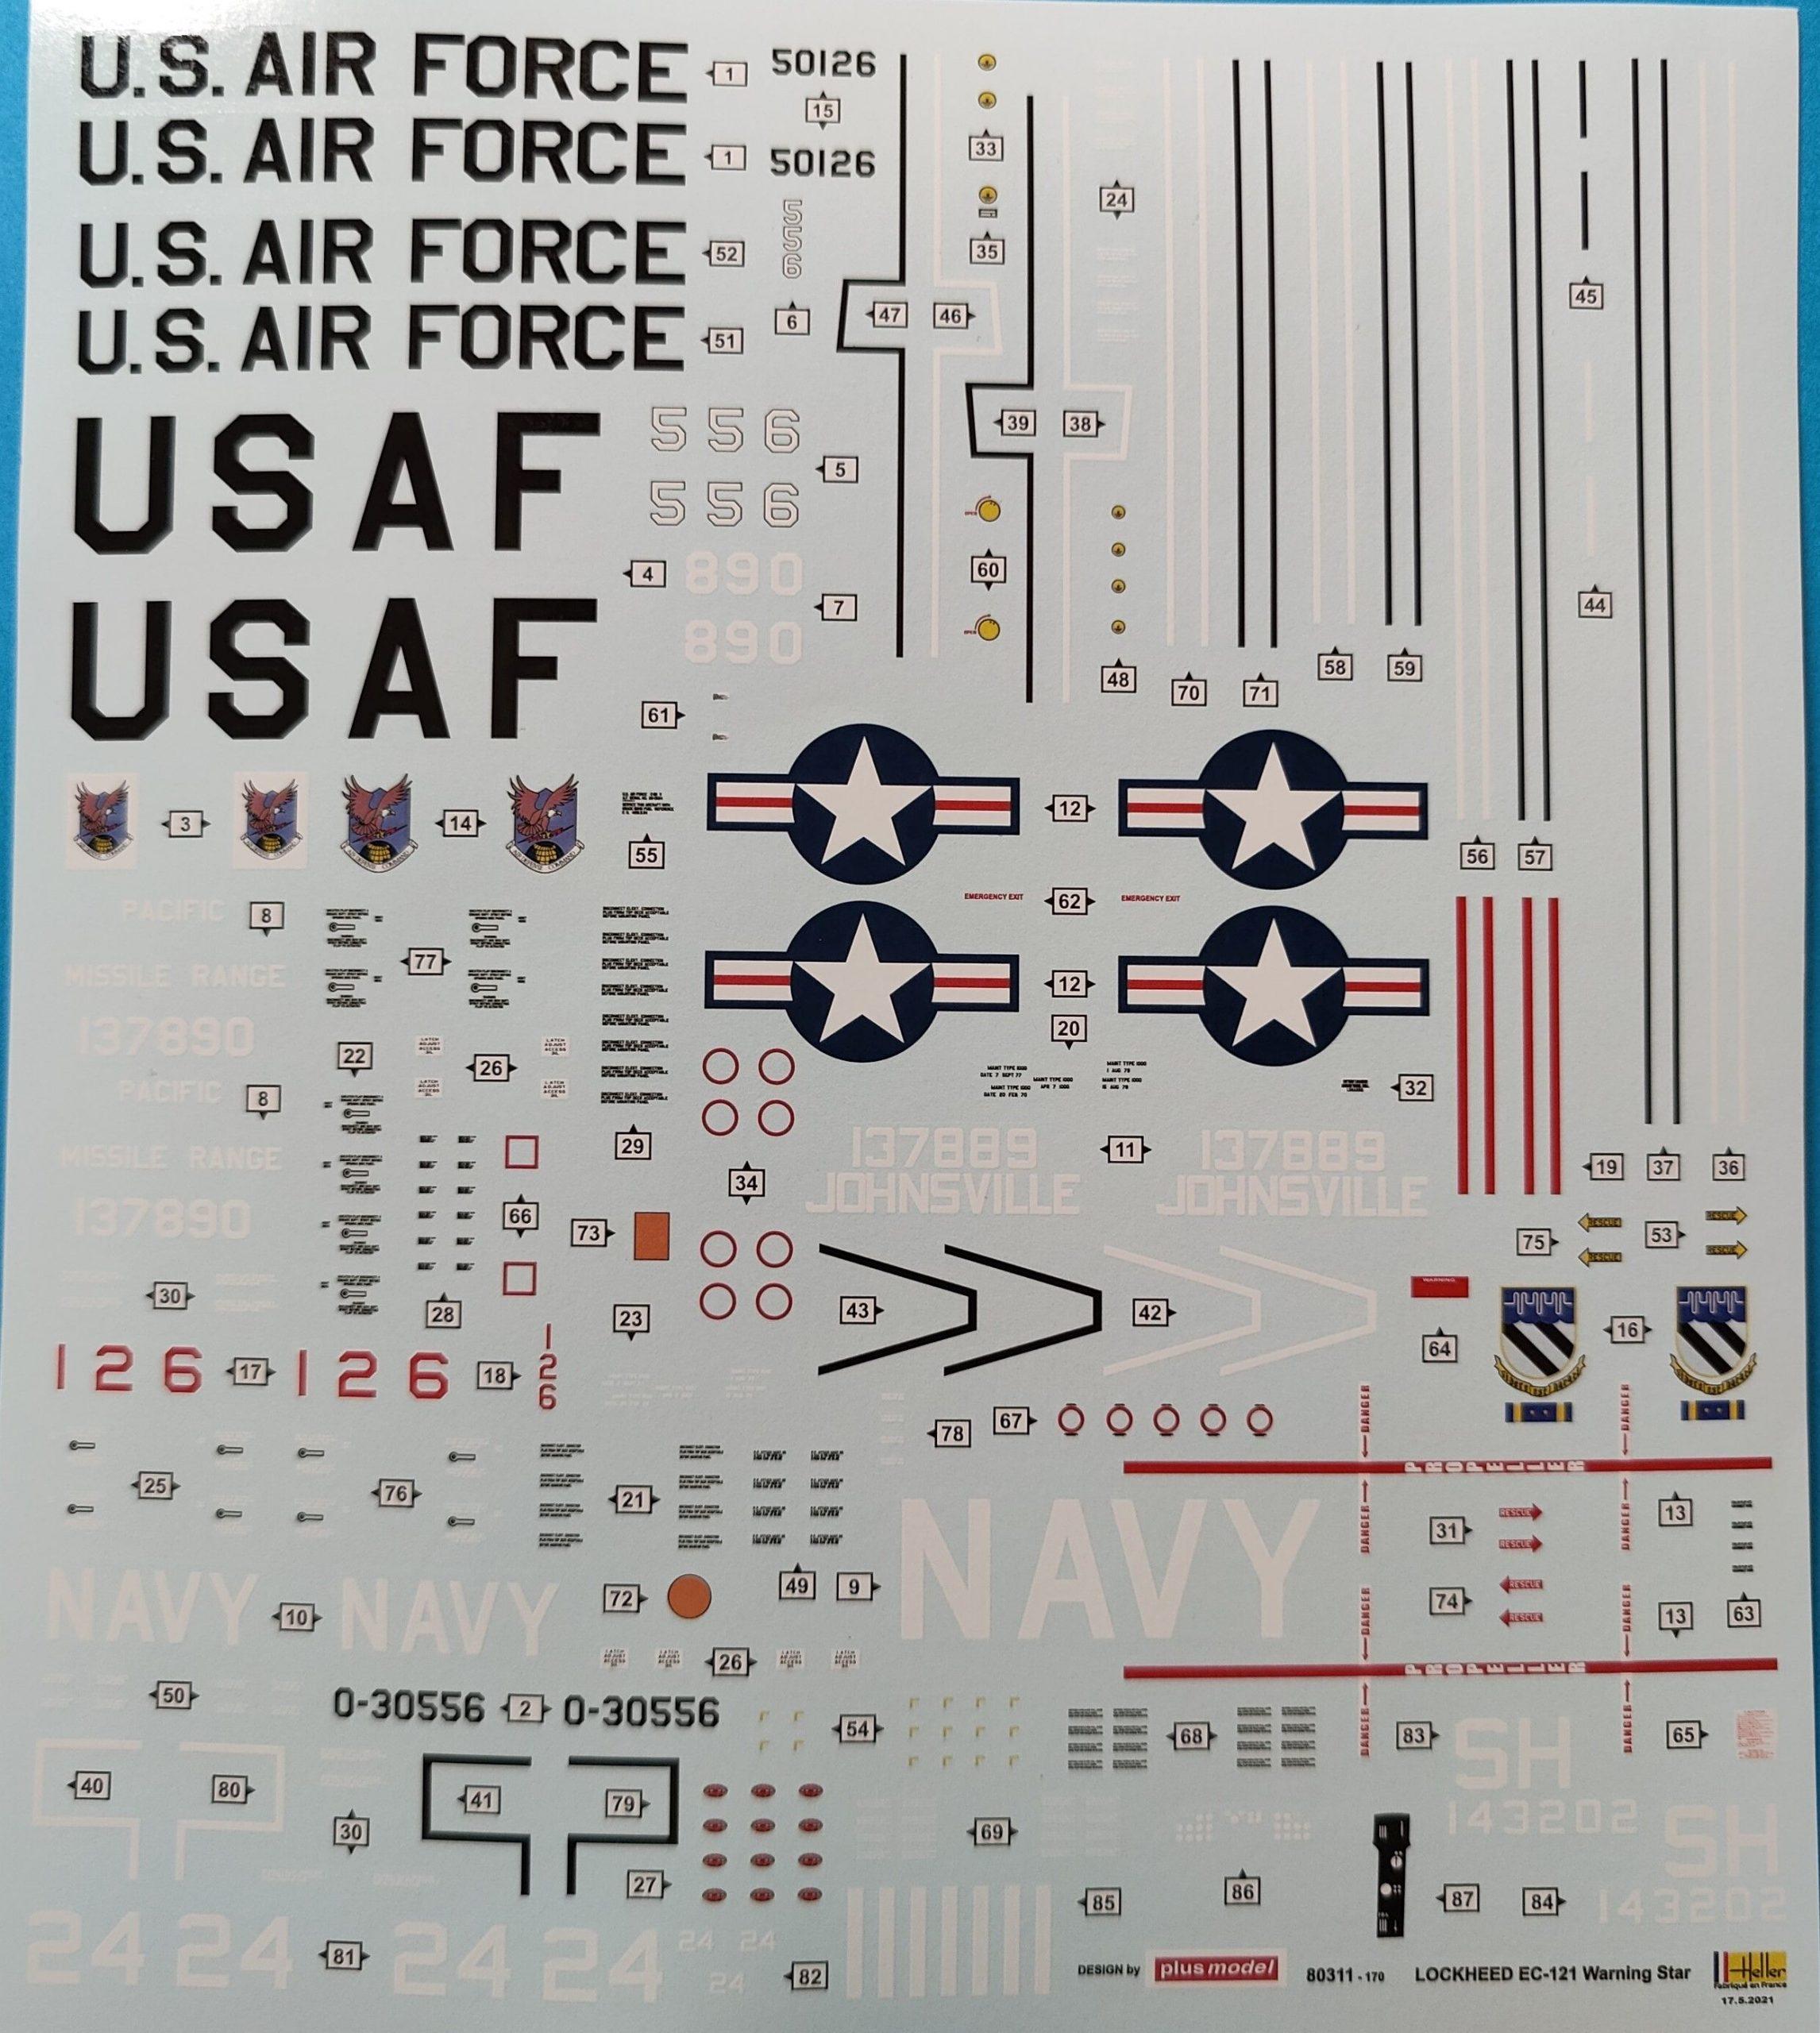 heller_lockheed_warn04-scaled Lockheed EC-121 Warning Star von Heller in 1:72